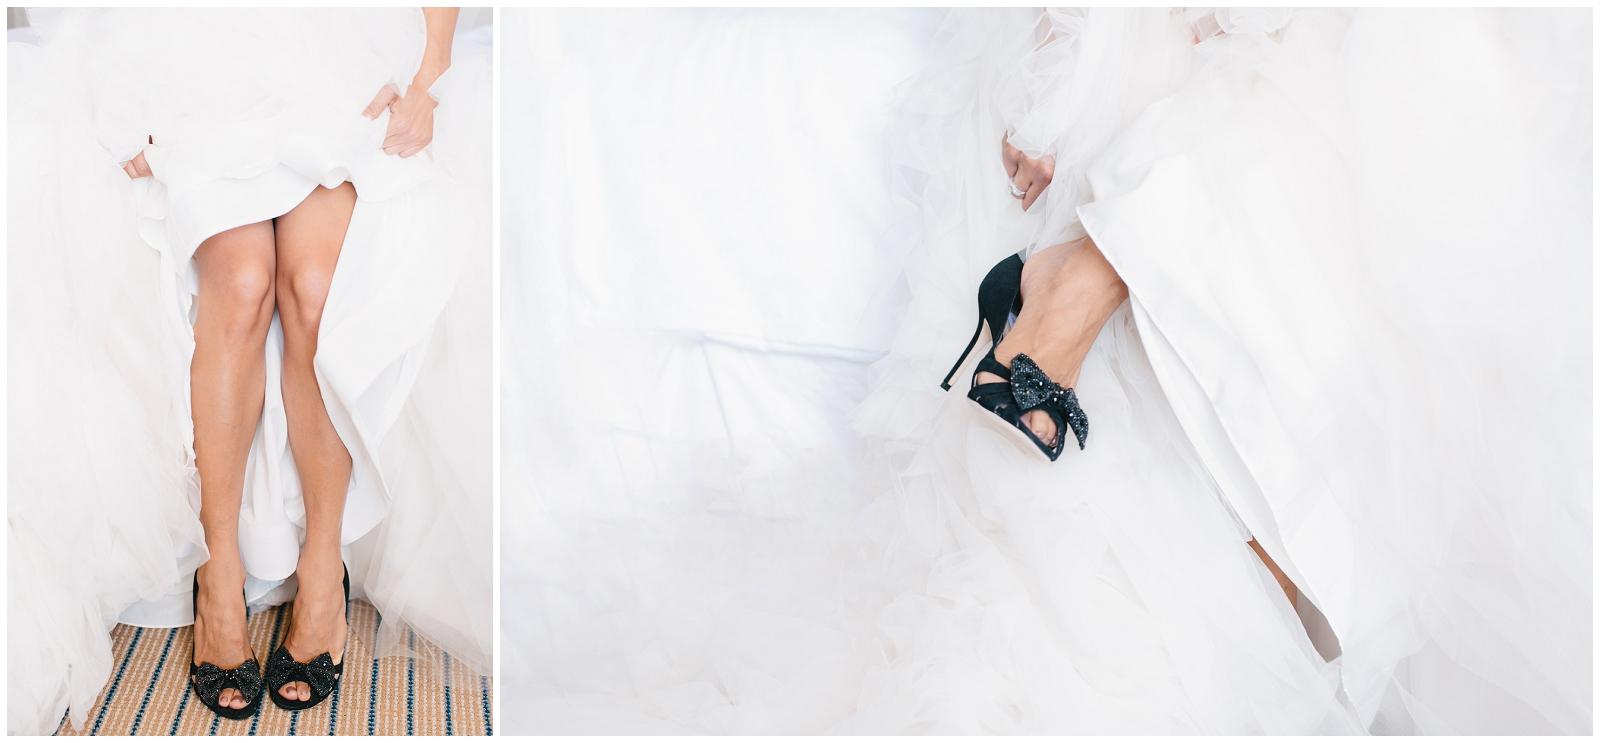 San-Francisco-Bay-Area-Wedding-Photography-Destination-6.jpg